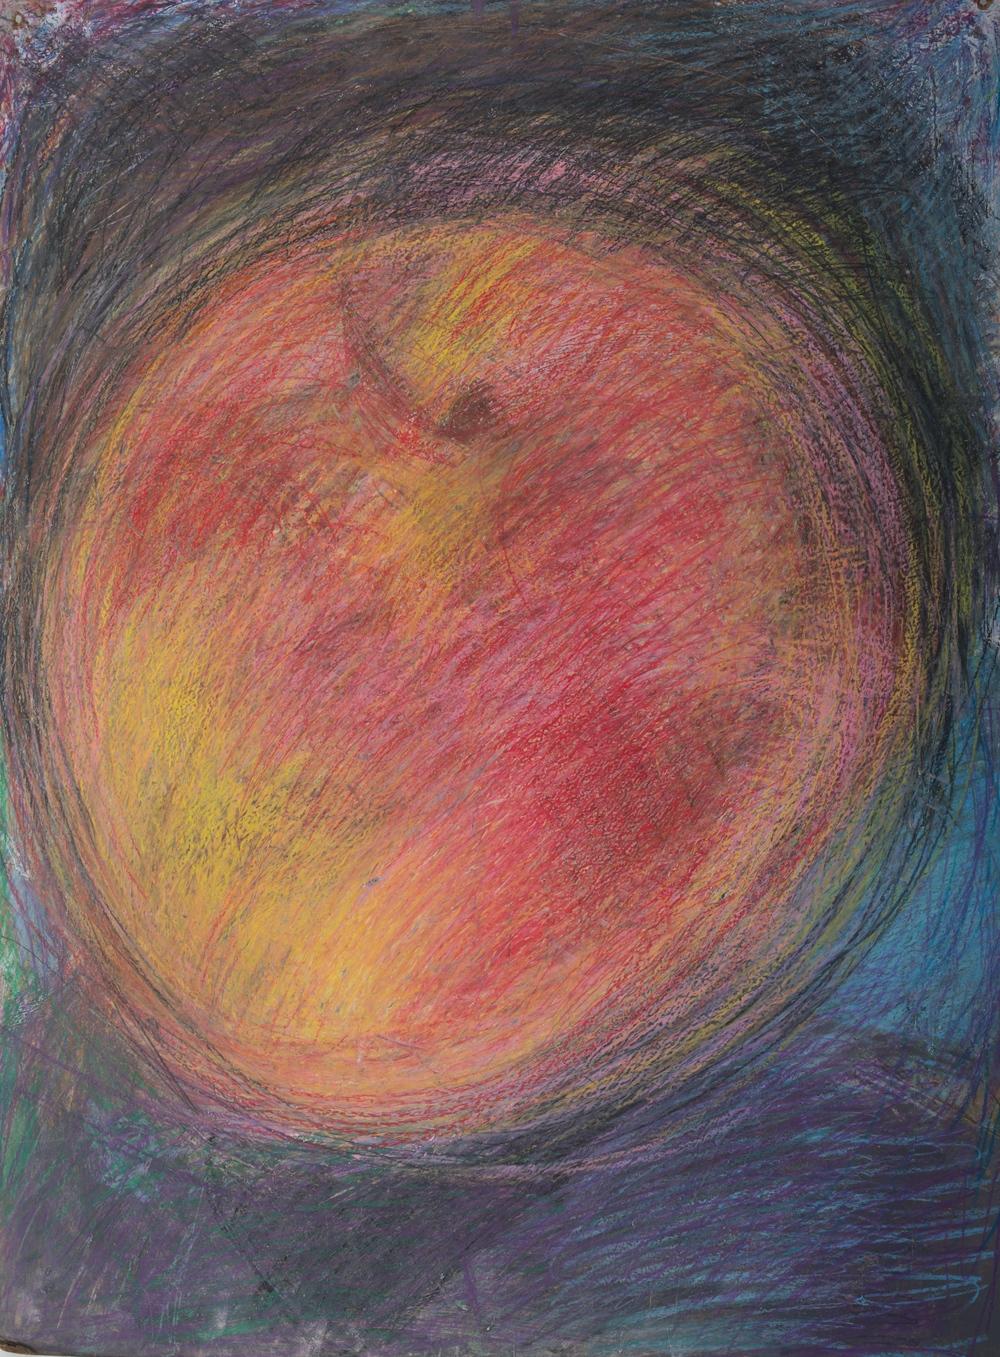 johnsarkinsunfruit.jpg